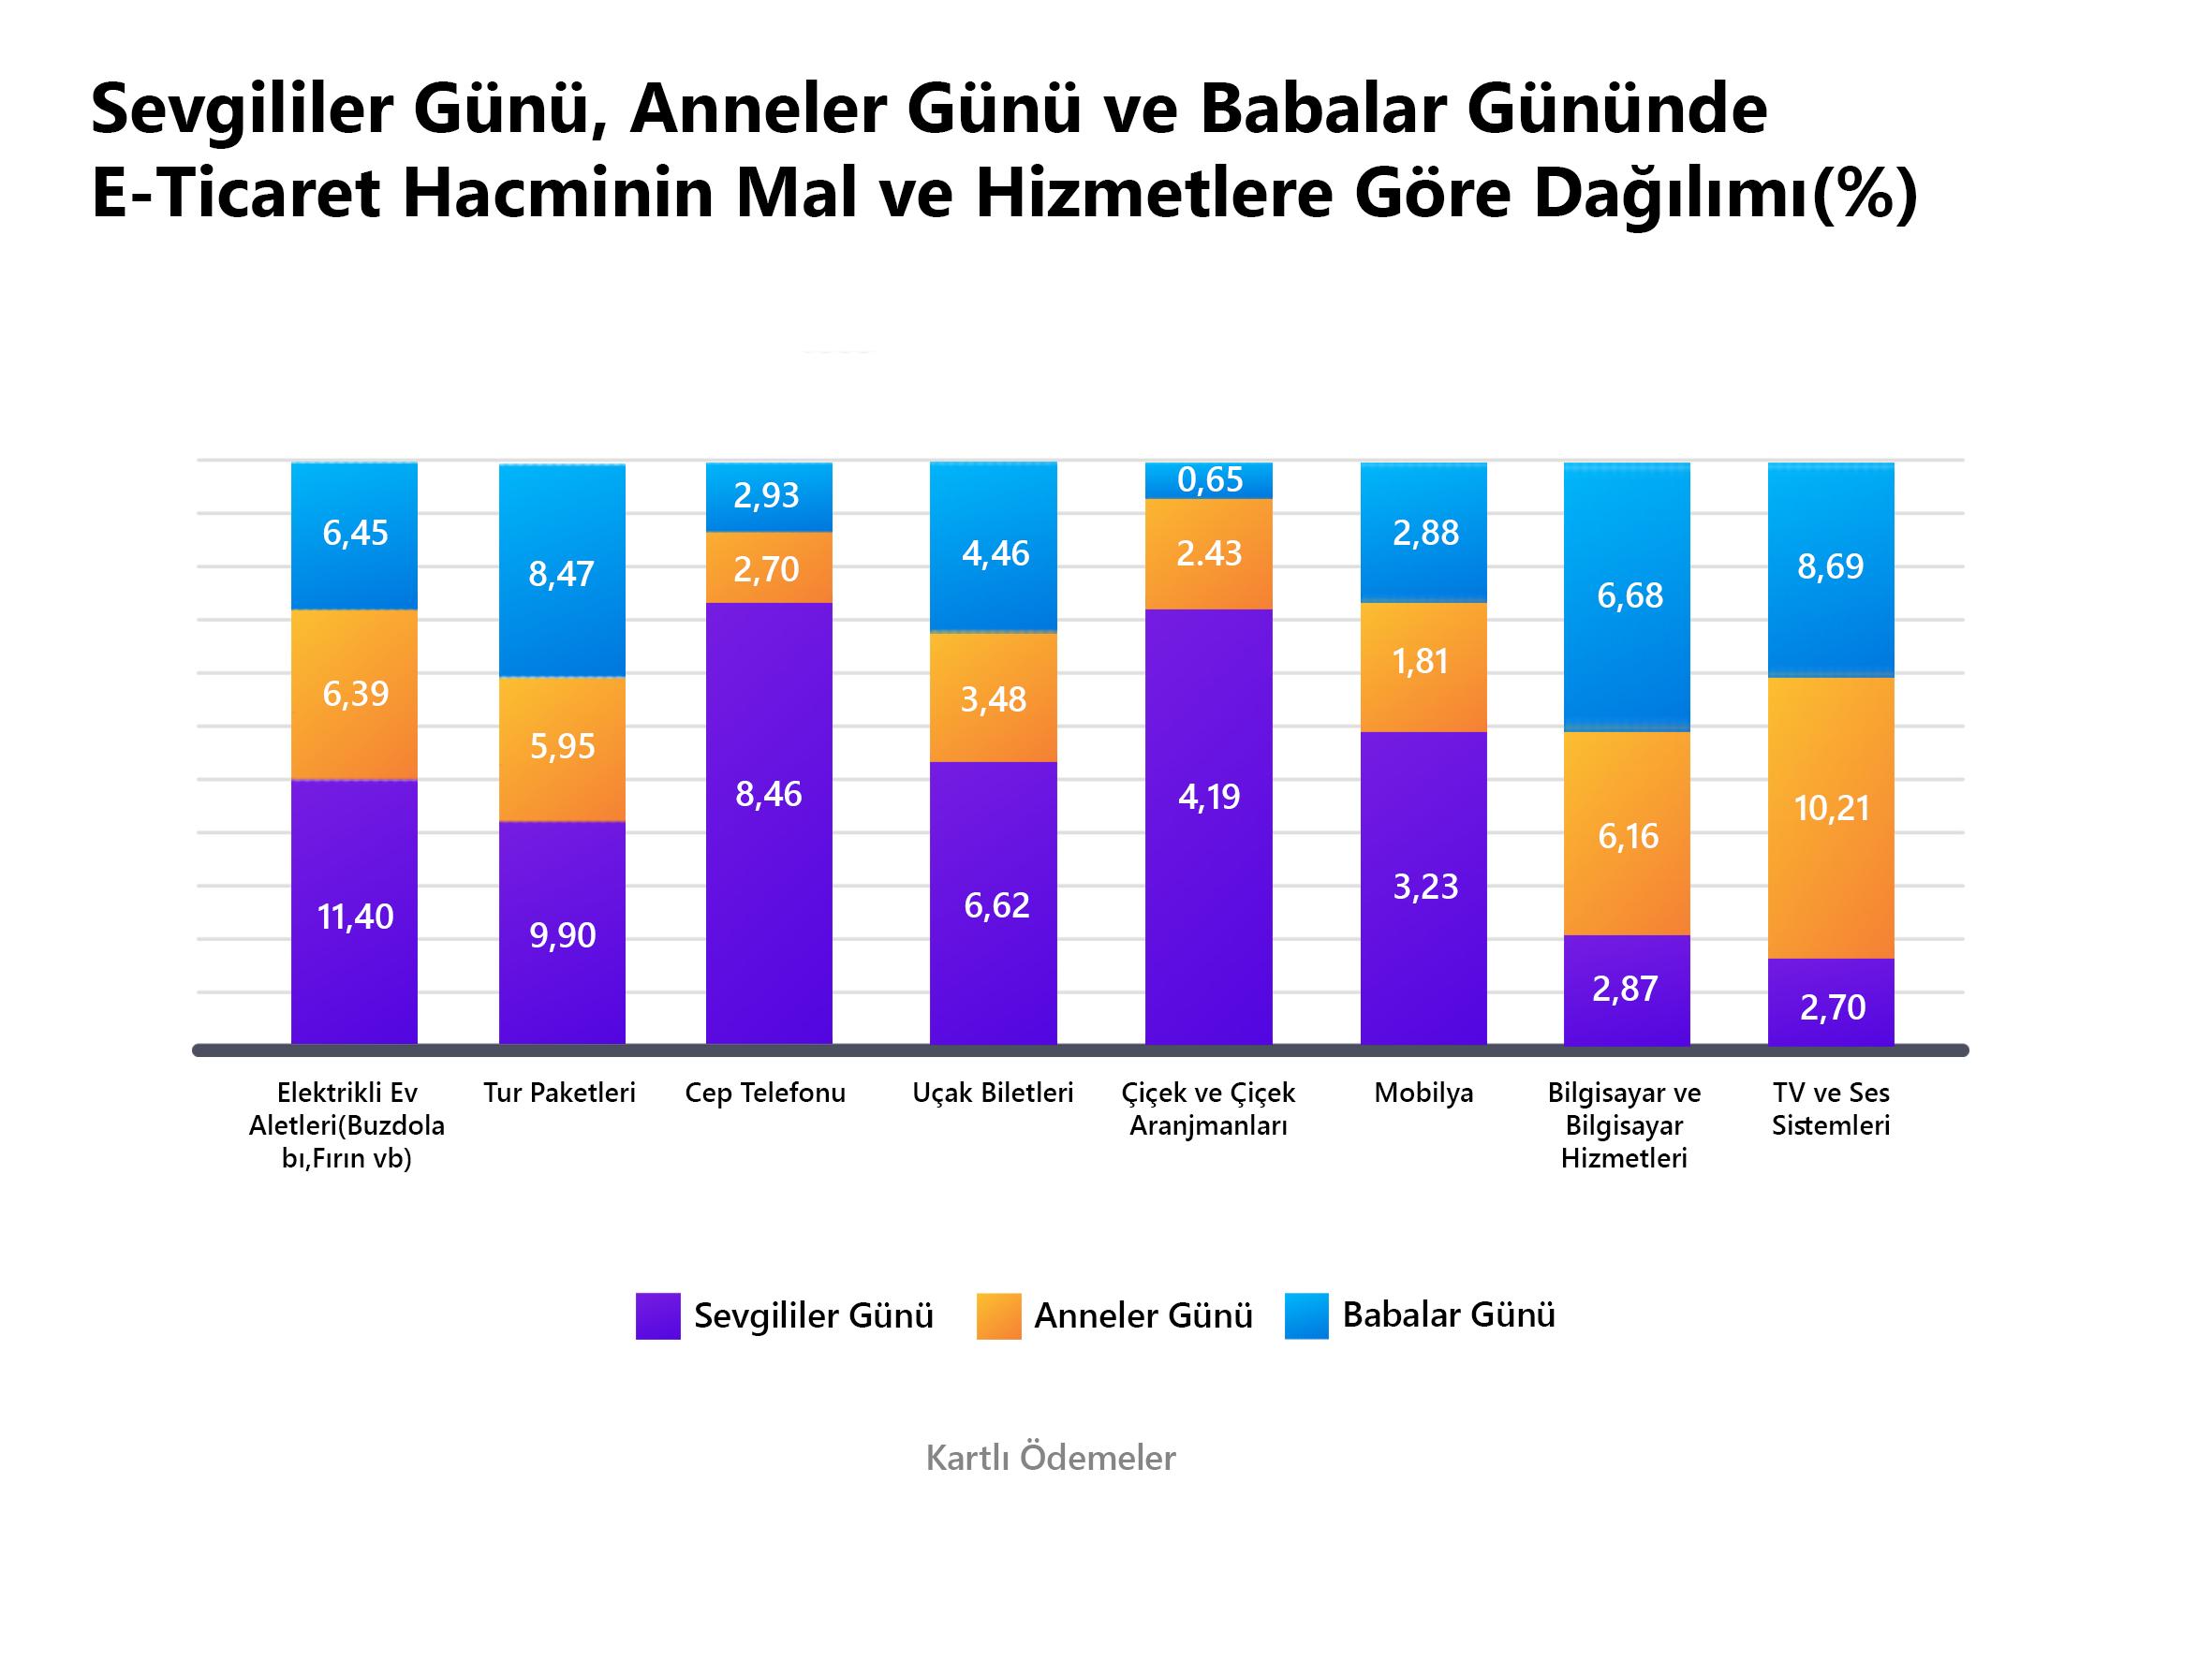 [Resim: %c3%96ZELG%c3%9cNLEREG%c3%96REDA%c4%9eILIM.png]